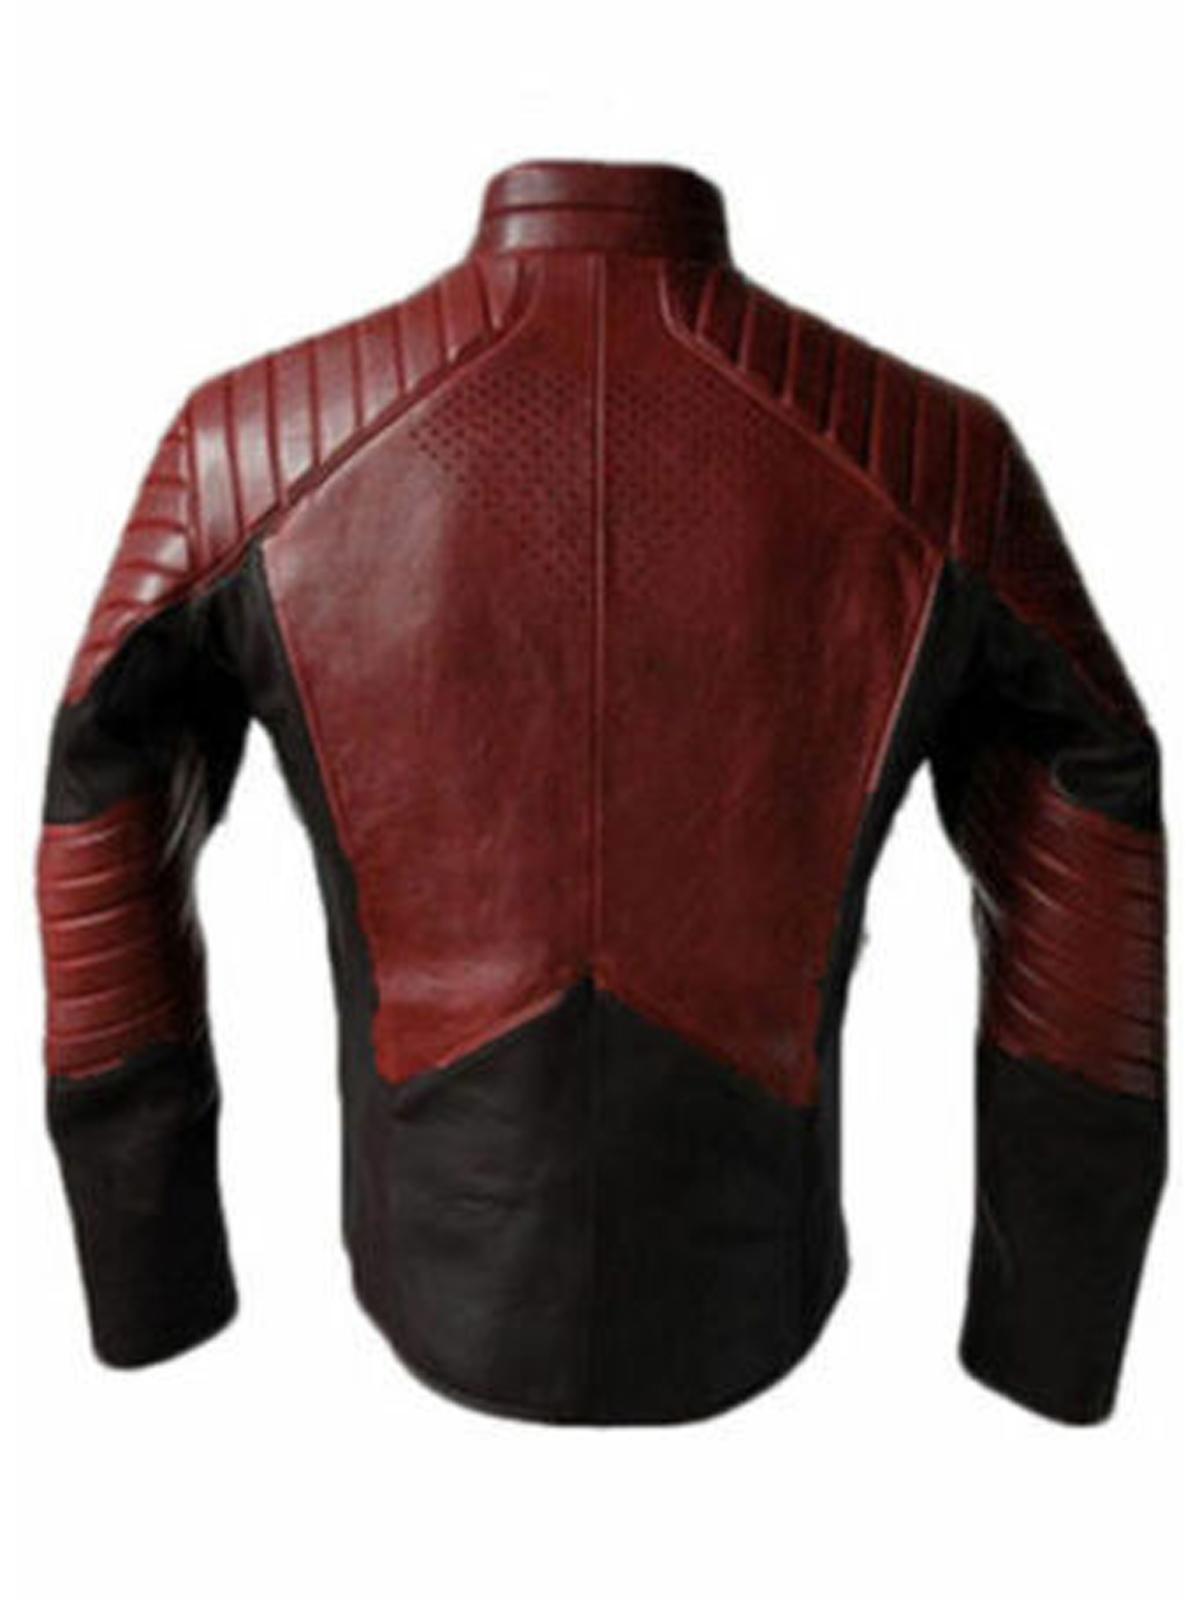 Superman Burgundy Red & Black Leather Jacket